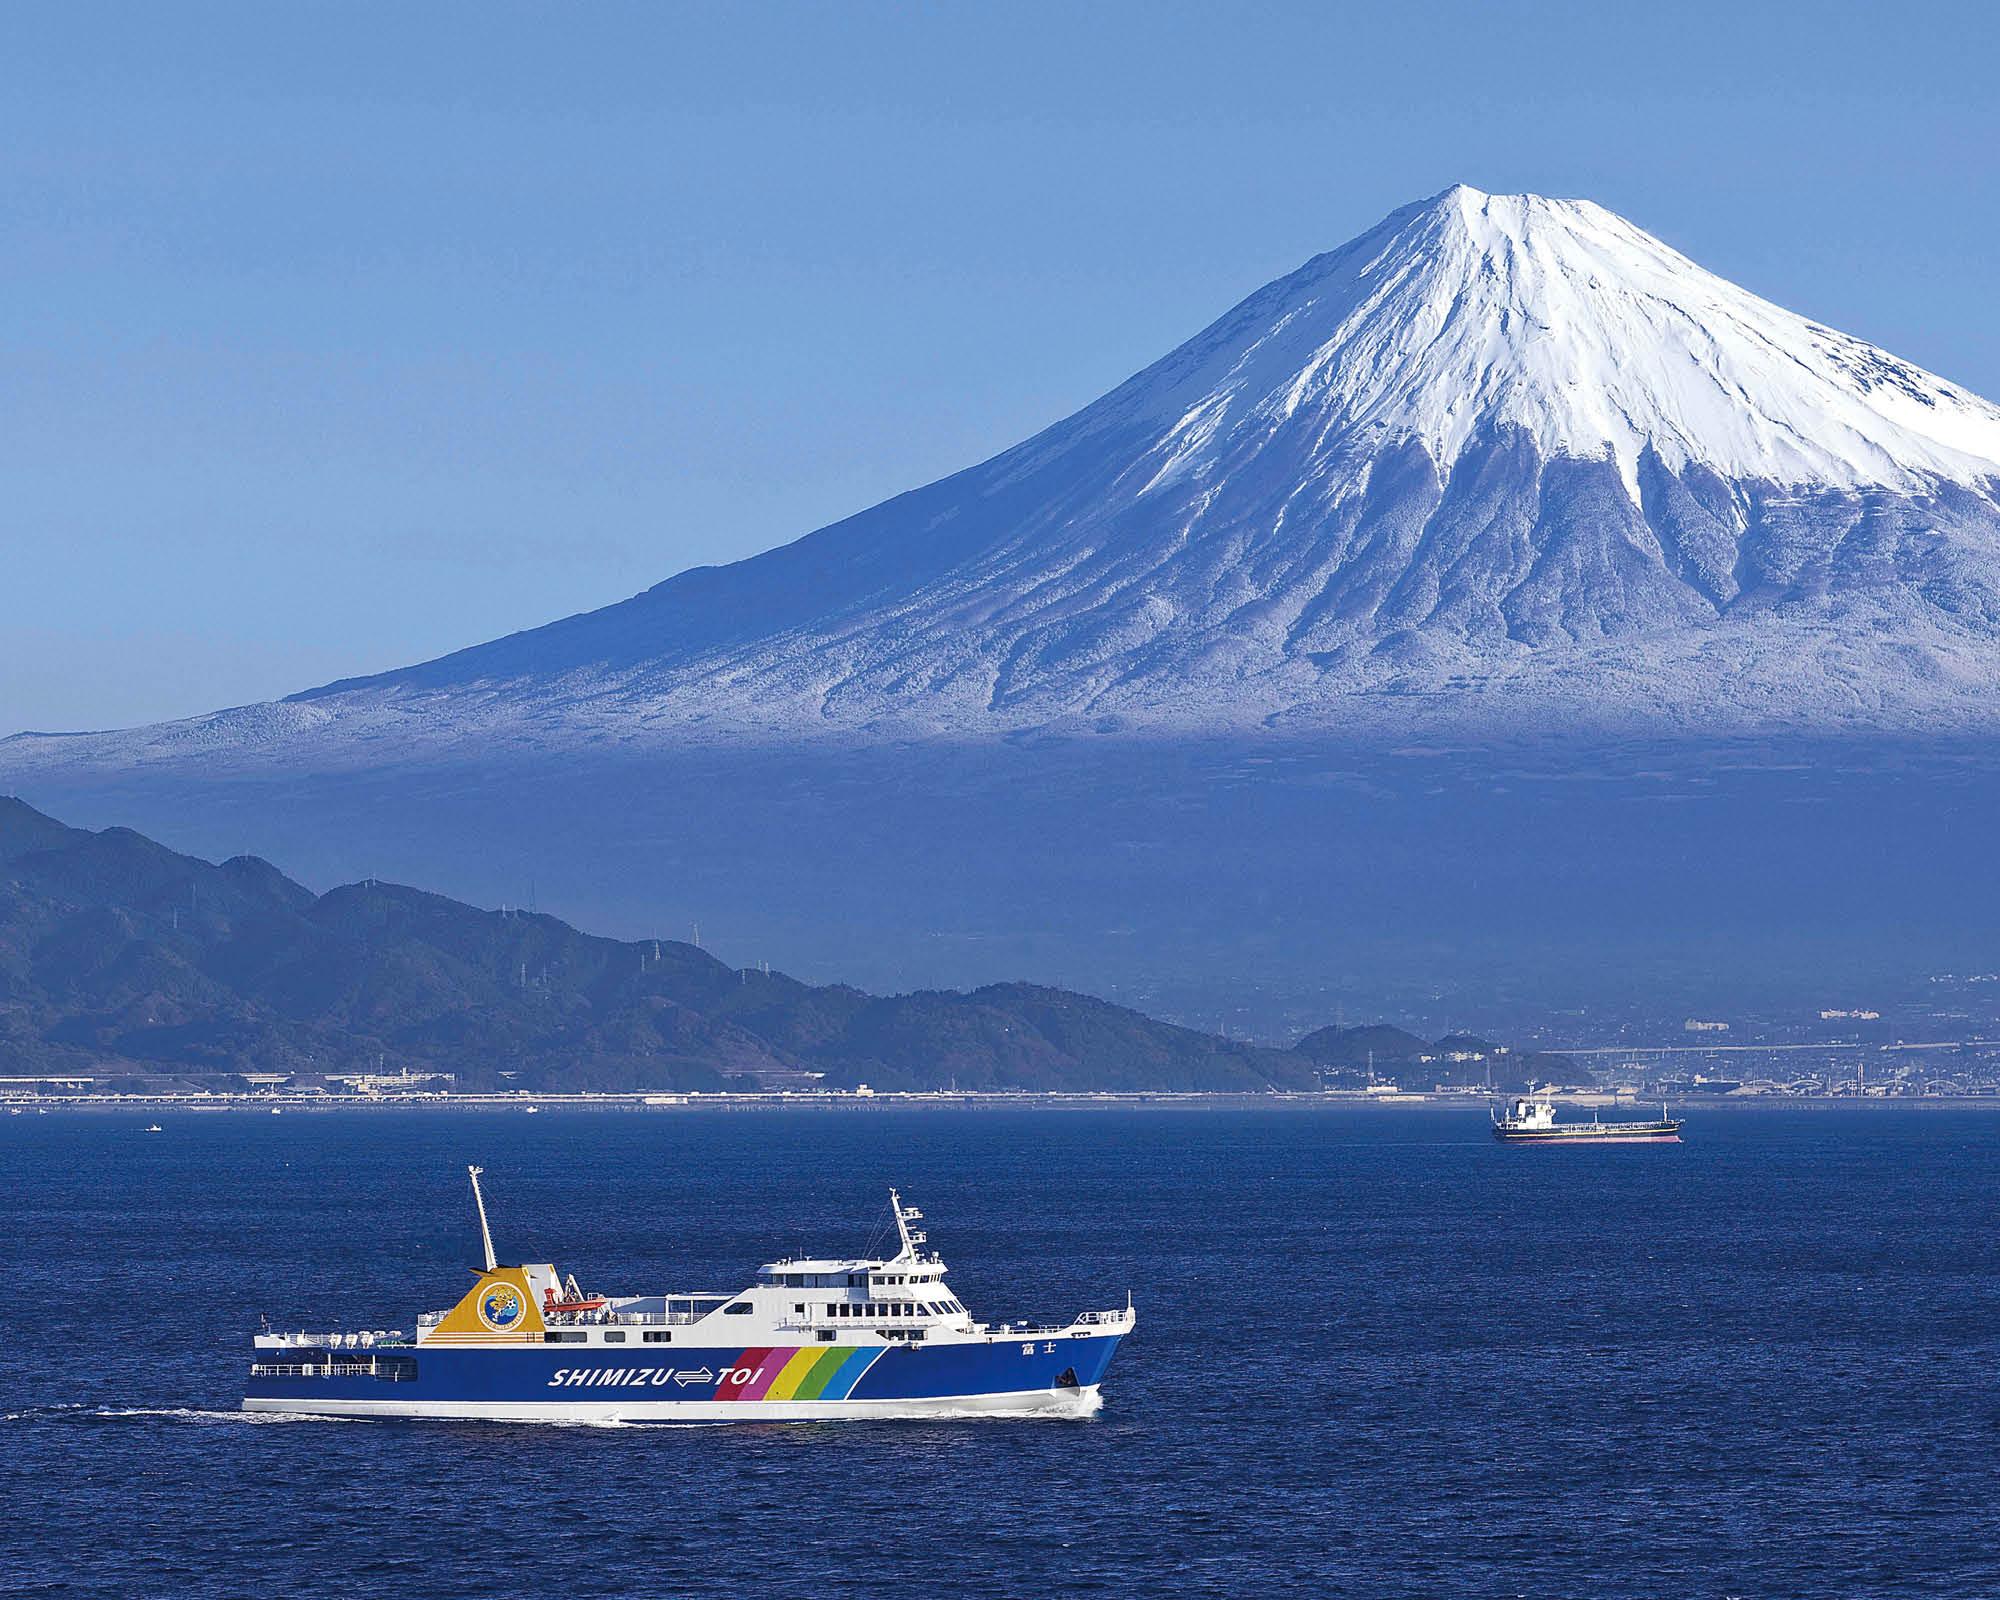 https://www.shizuoka-cb.com/wp-content/uploads/2021/04/photo-why11.jpg